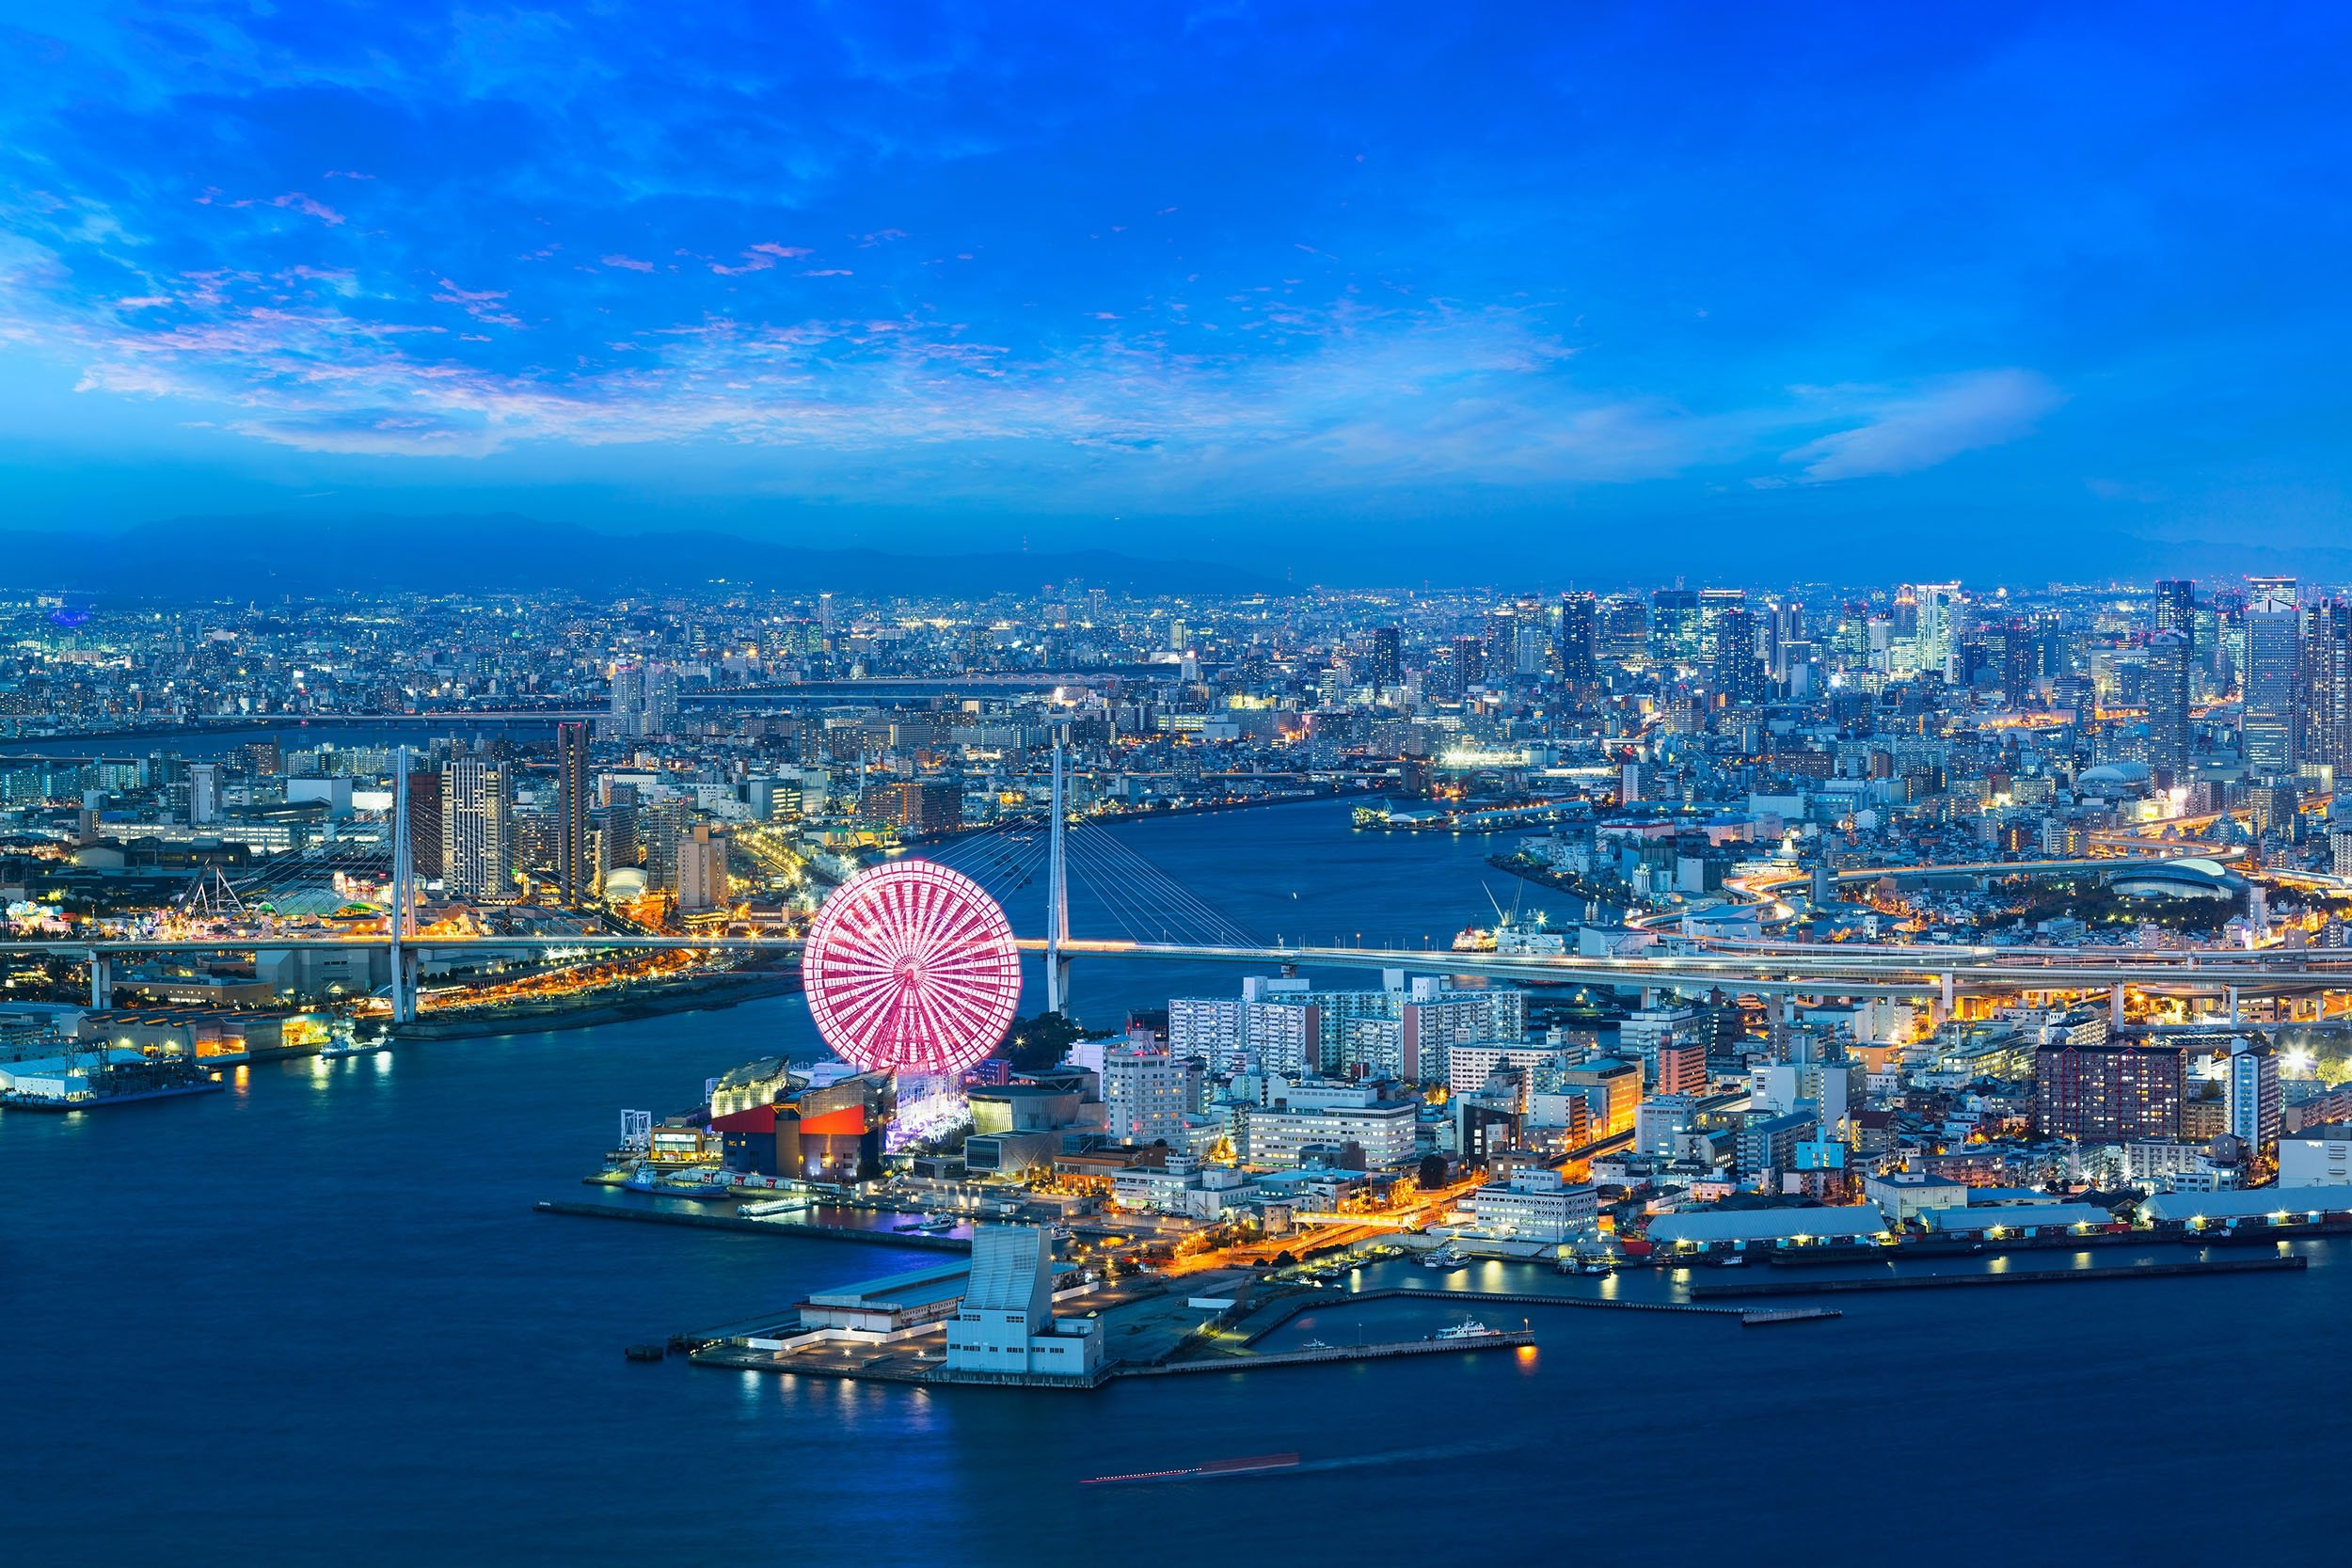 City lights brighten the night in Osaka, Japan. (Shutterstock Photo)